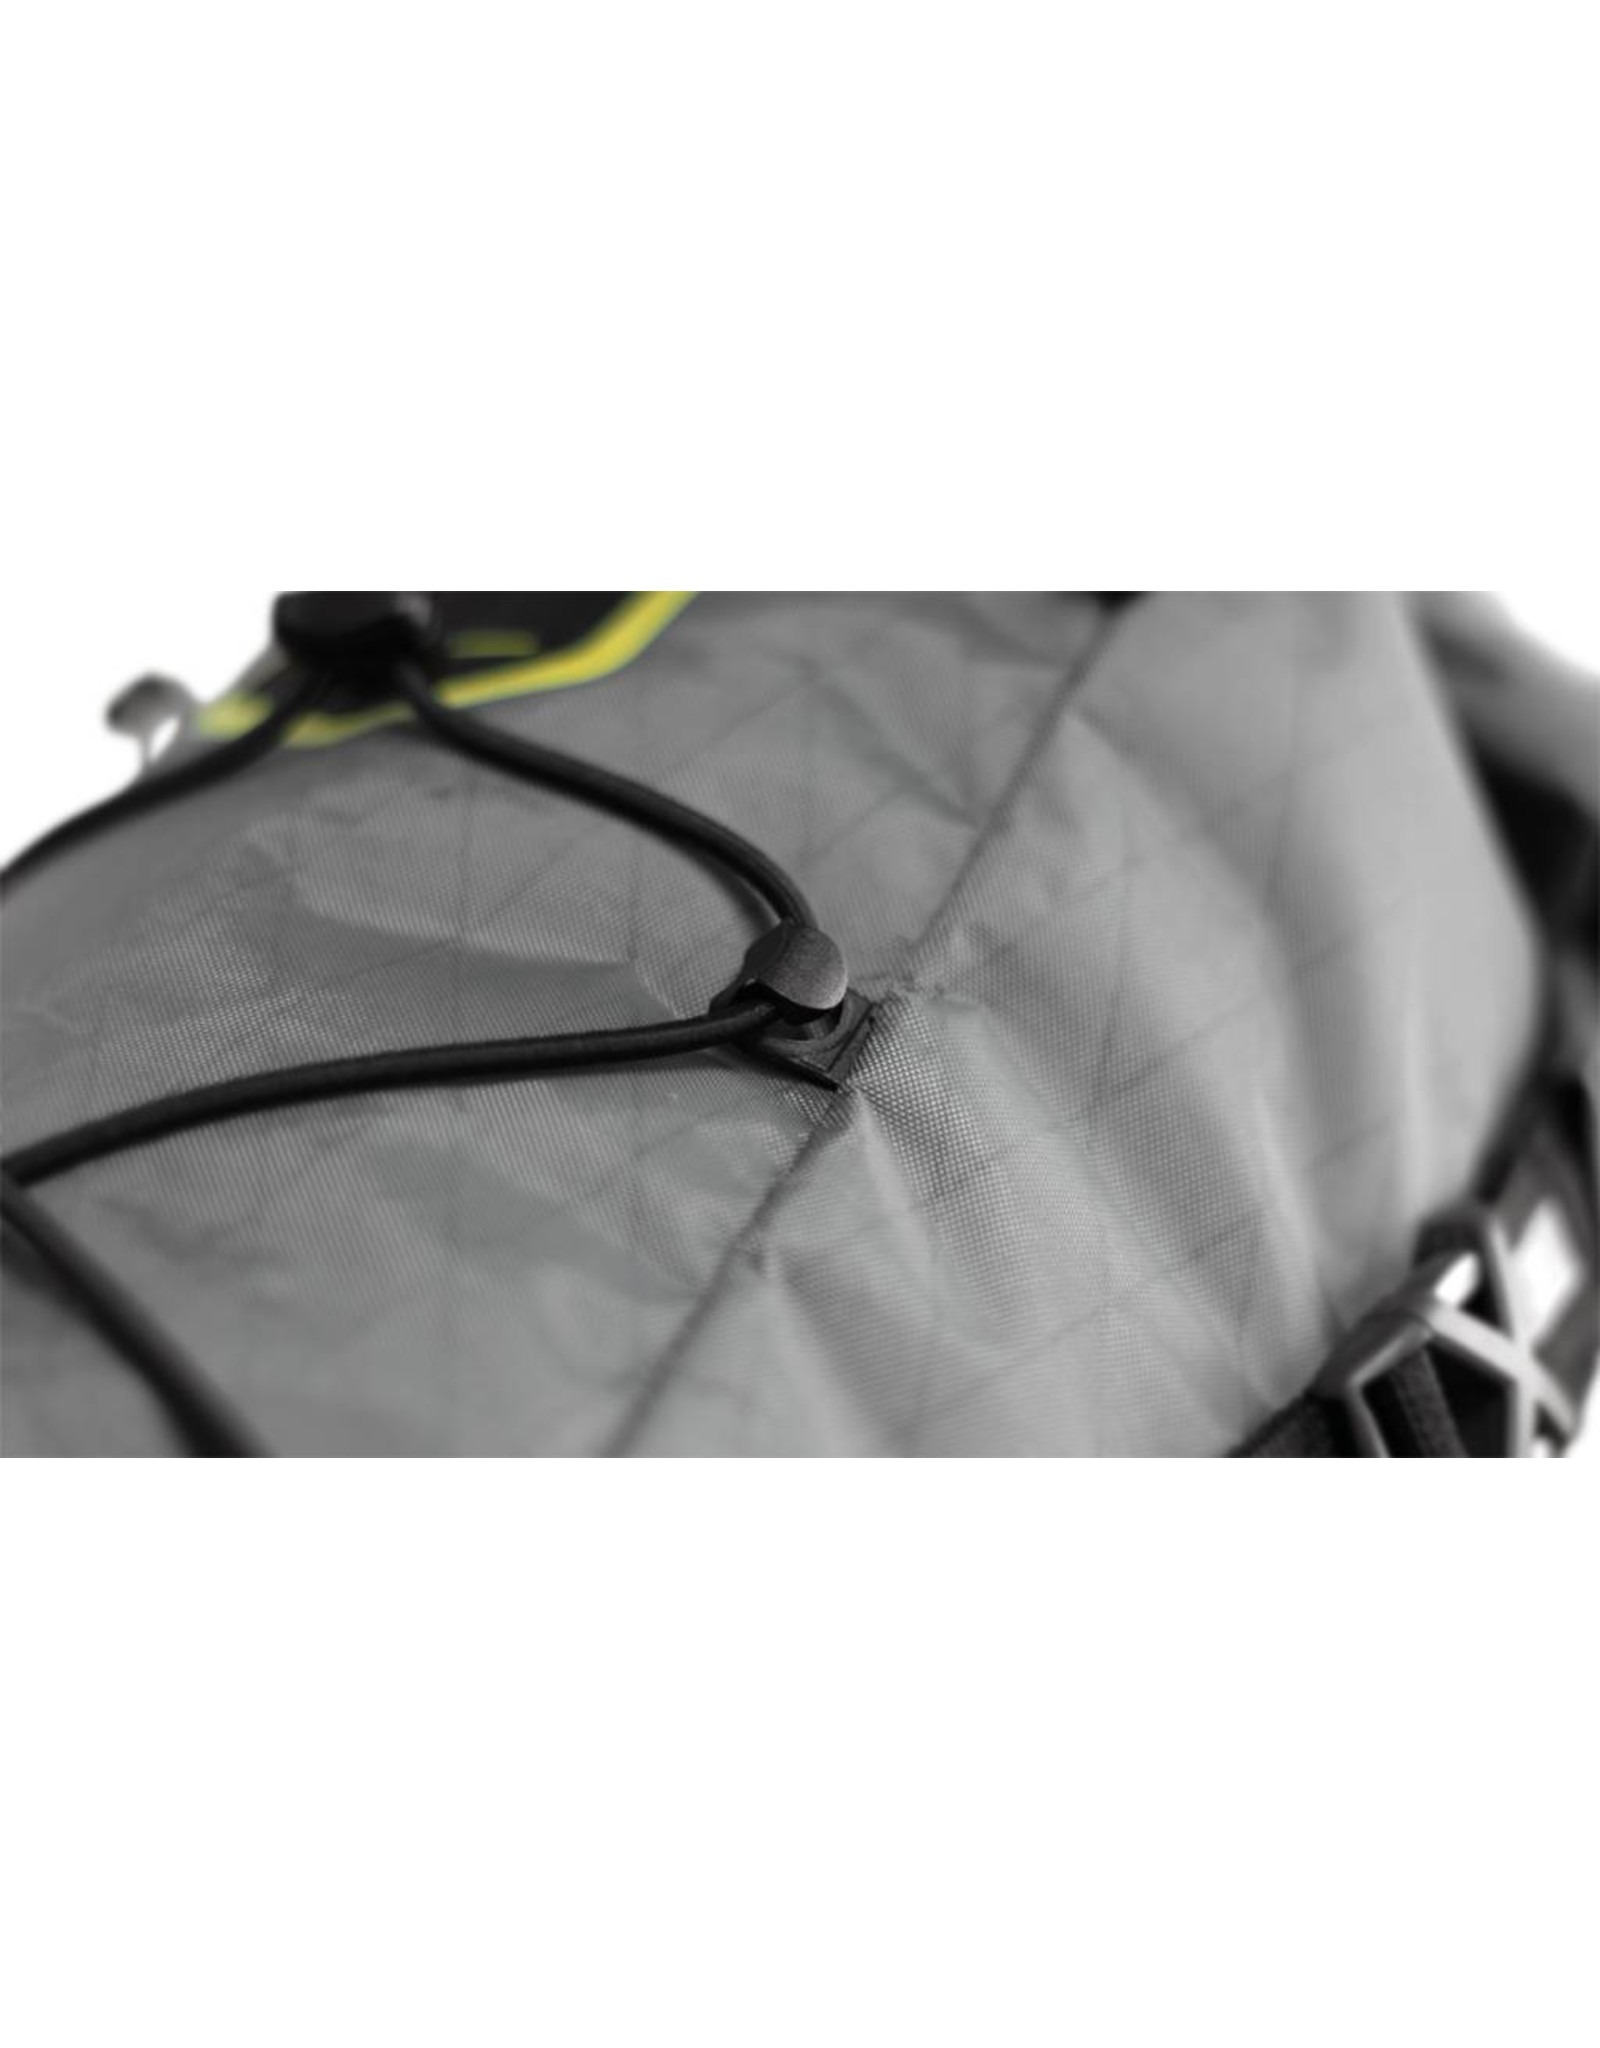 Apidura Apidura Rear Saddle Pack, Mid-size 14 litre (cycle touring/bikepacking bag)